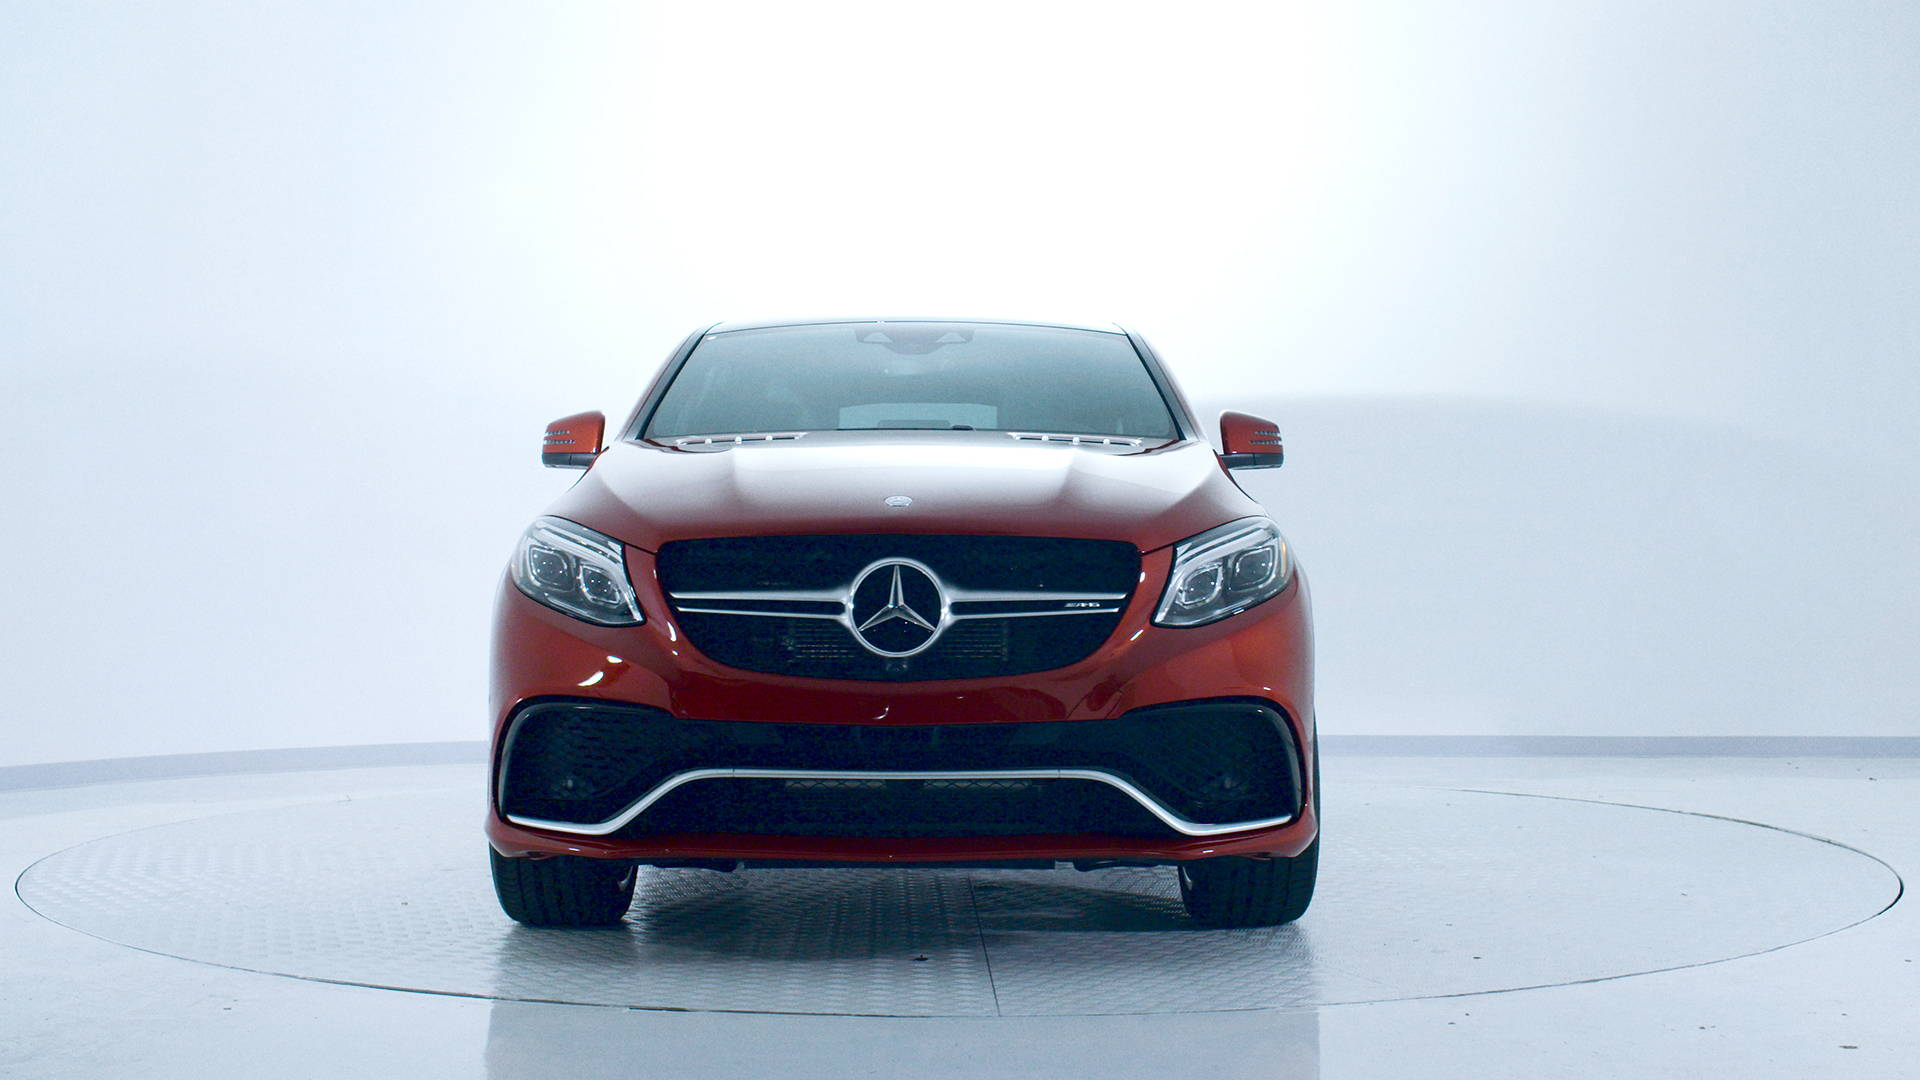 Mercedes Benz of McKinney - Media Production | Kinter Media